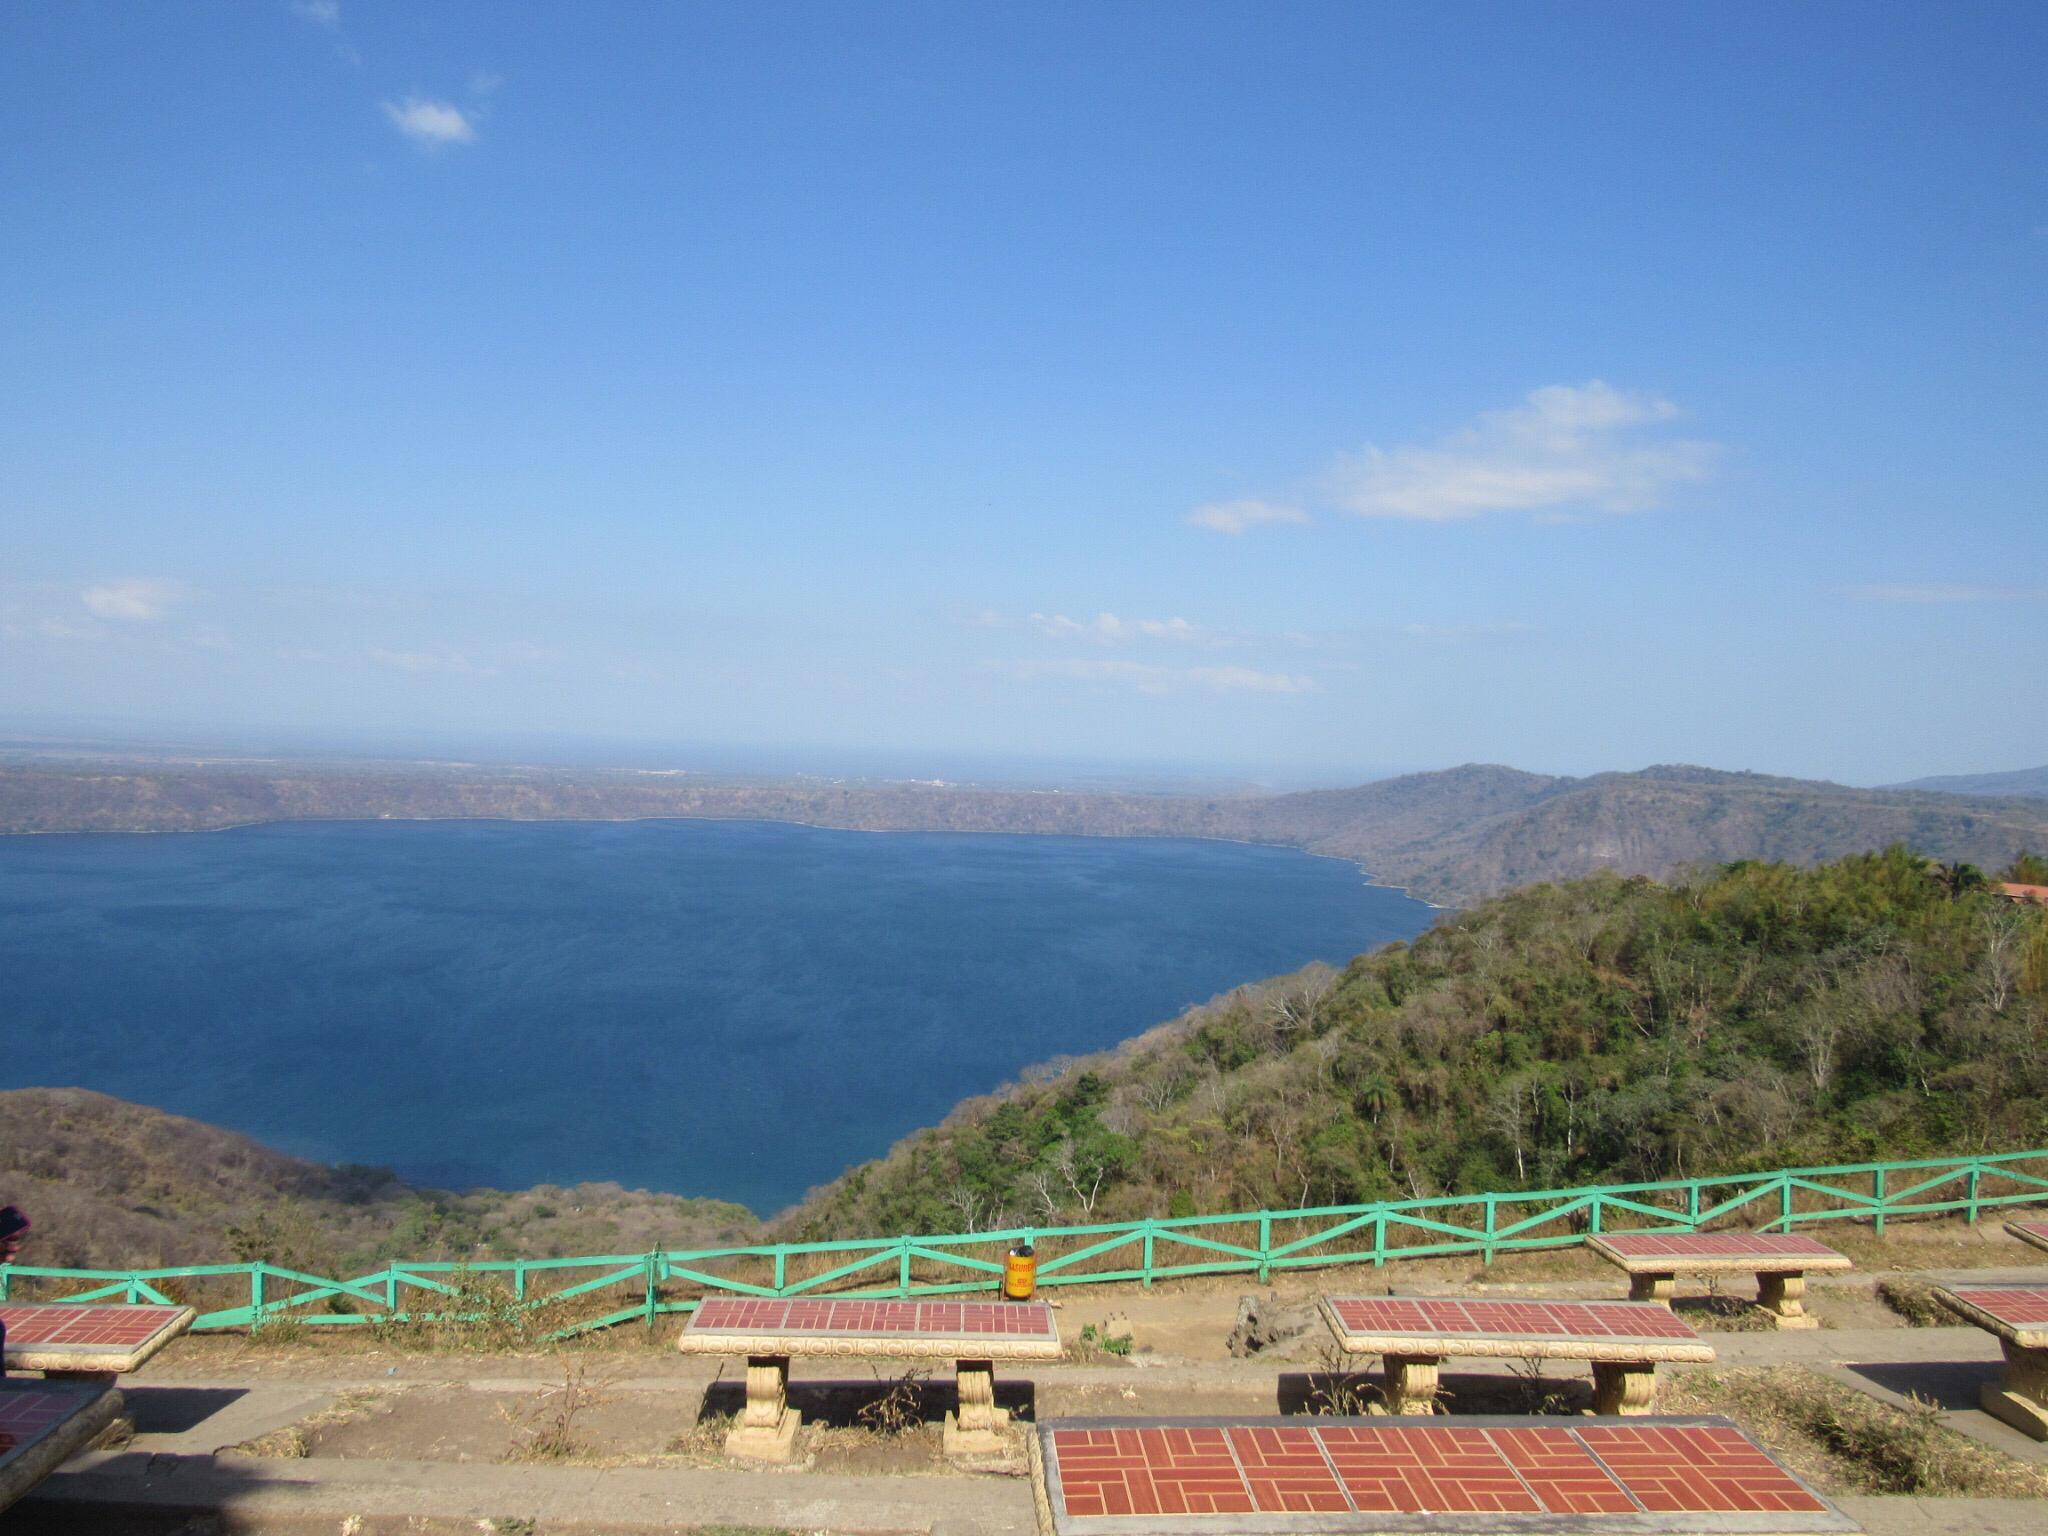 Mirador de Catarina, Nicaragua (Photo credit: Priscilla Zelaya)